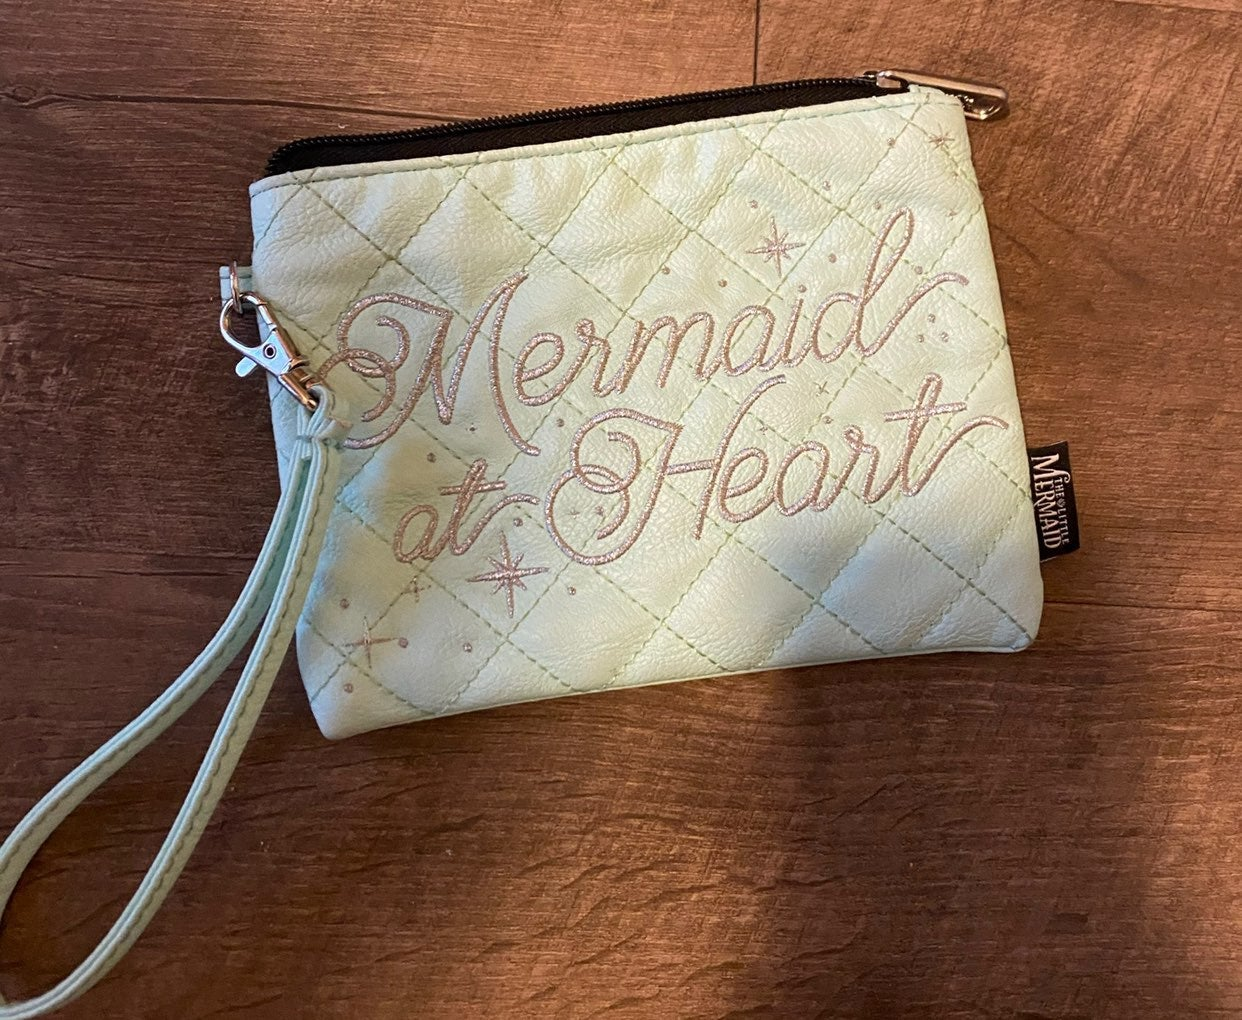 Disney The Little Mermaid wristlet bag